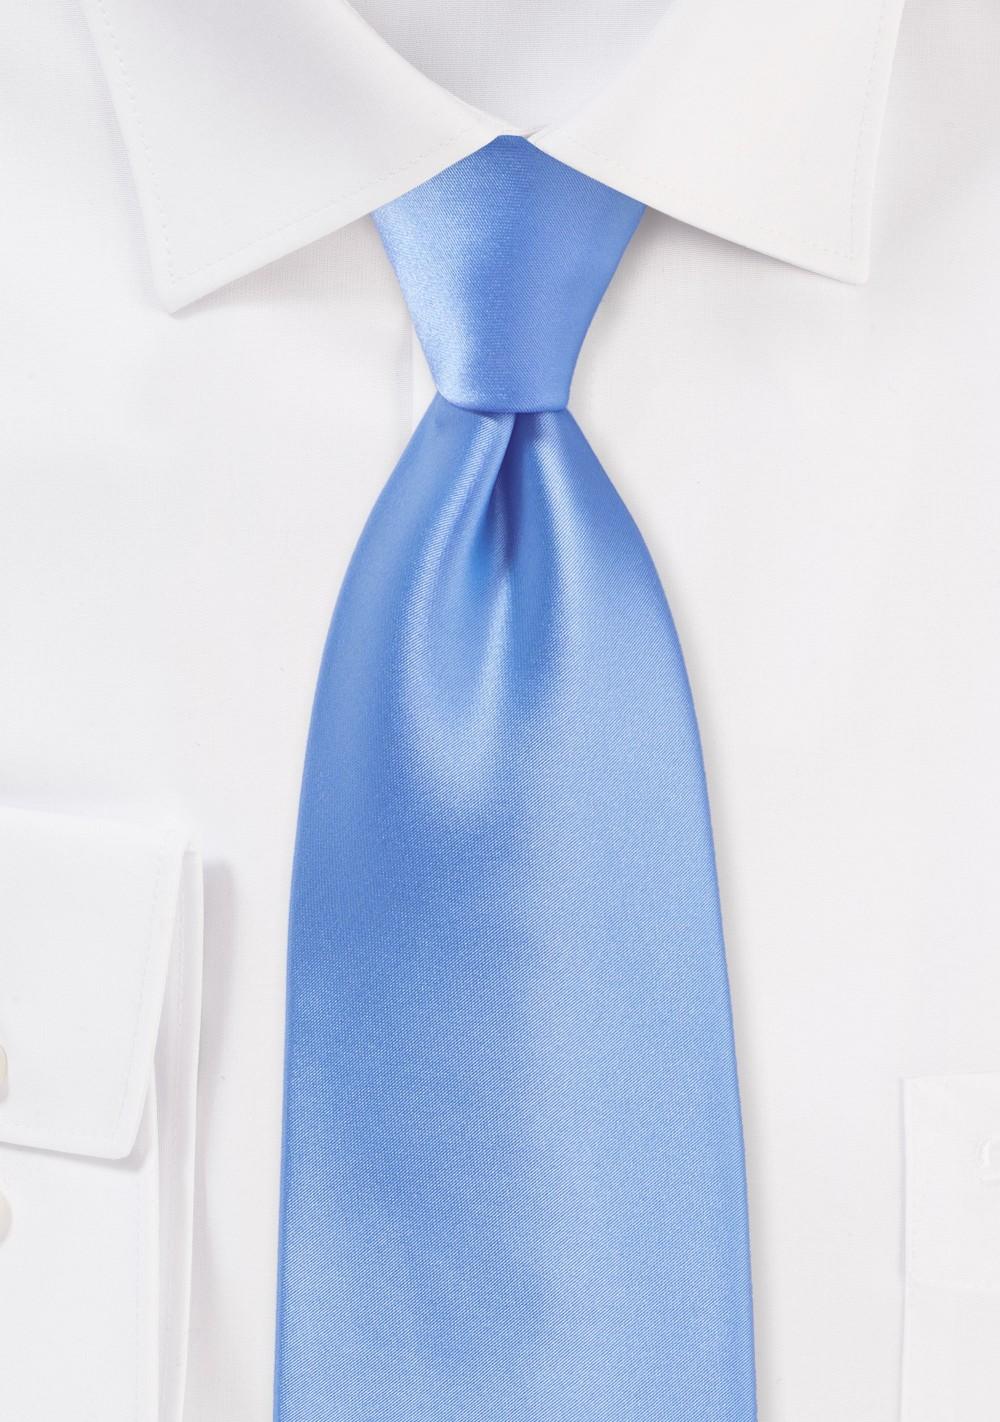 Bright Sky Blue Necktie